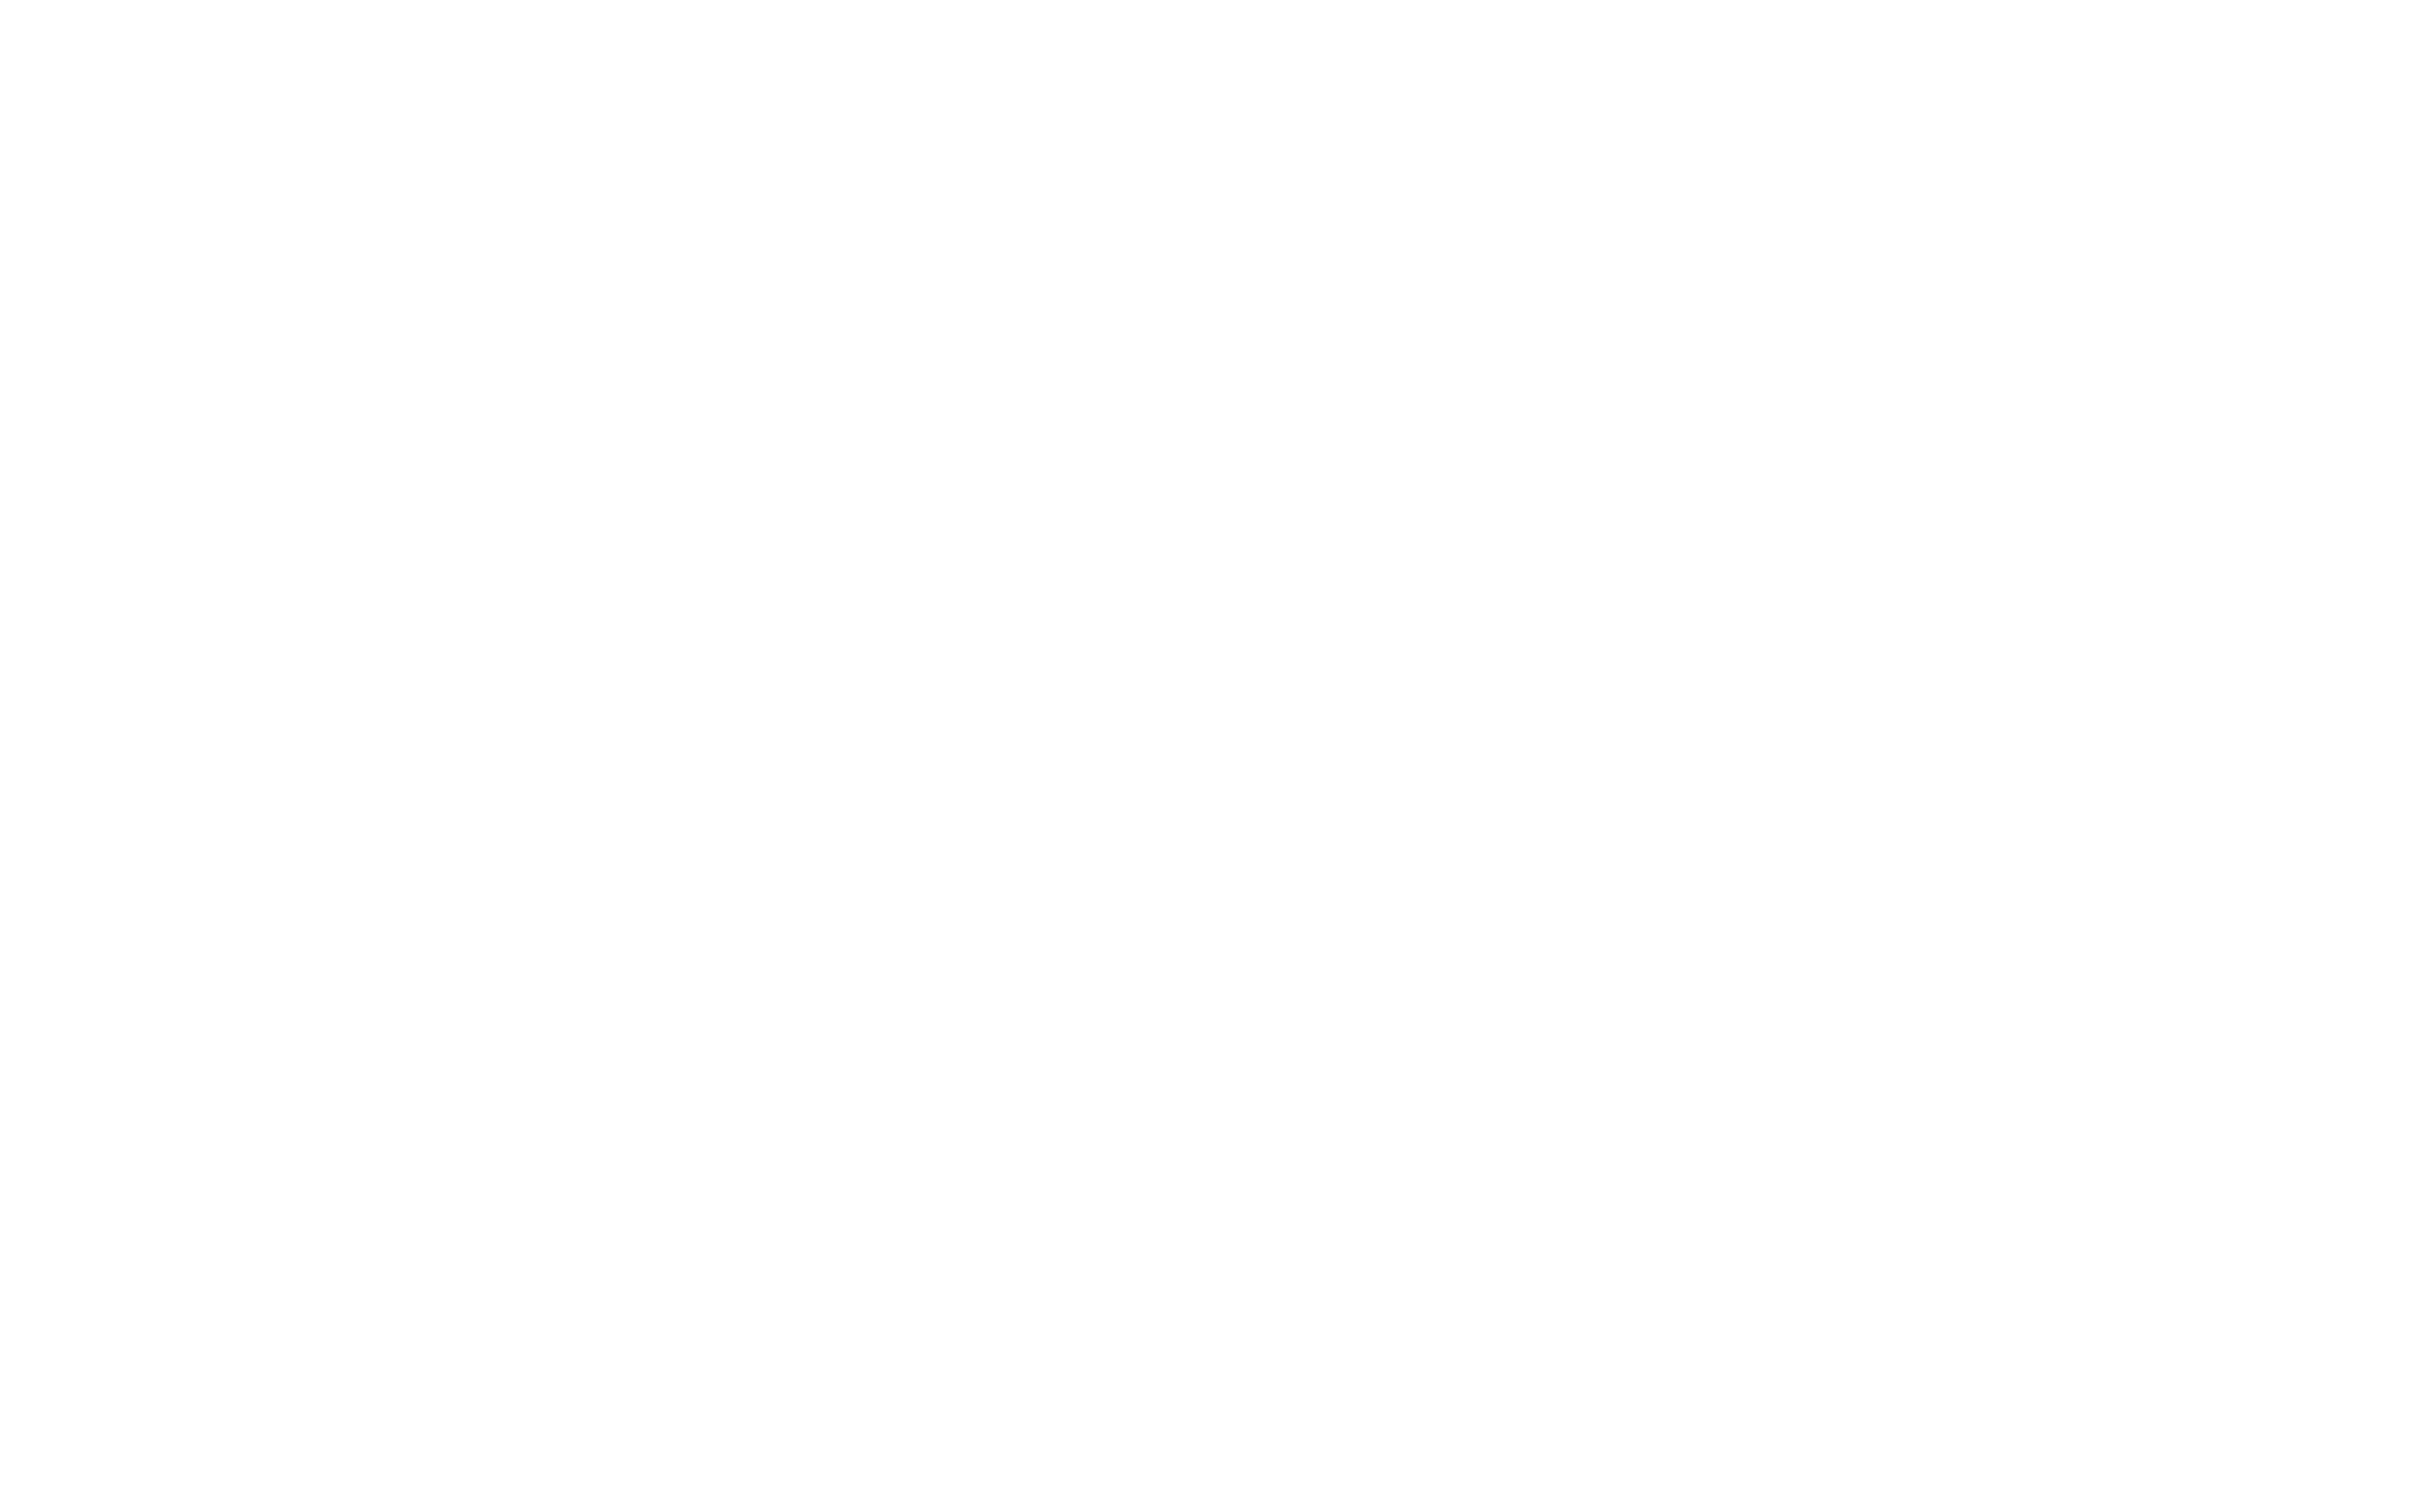 CPLFanAwards-Wordmark - white_Fan Awards Wordmark - white